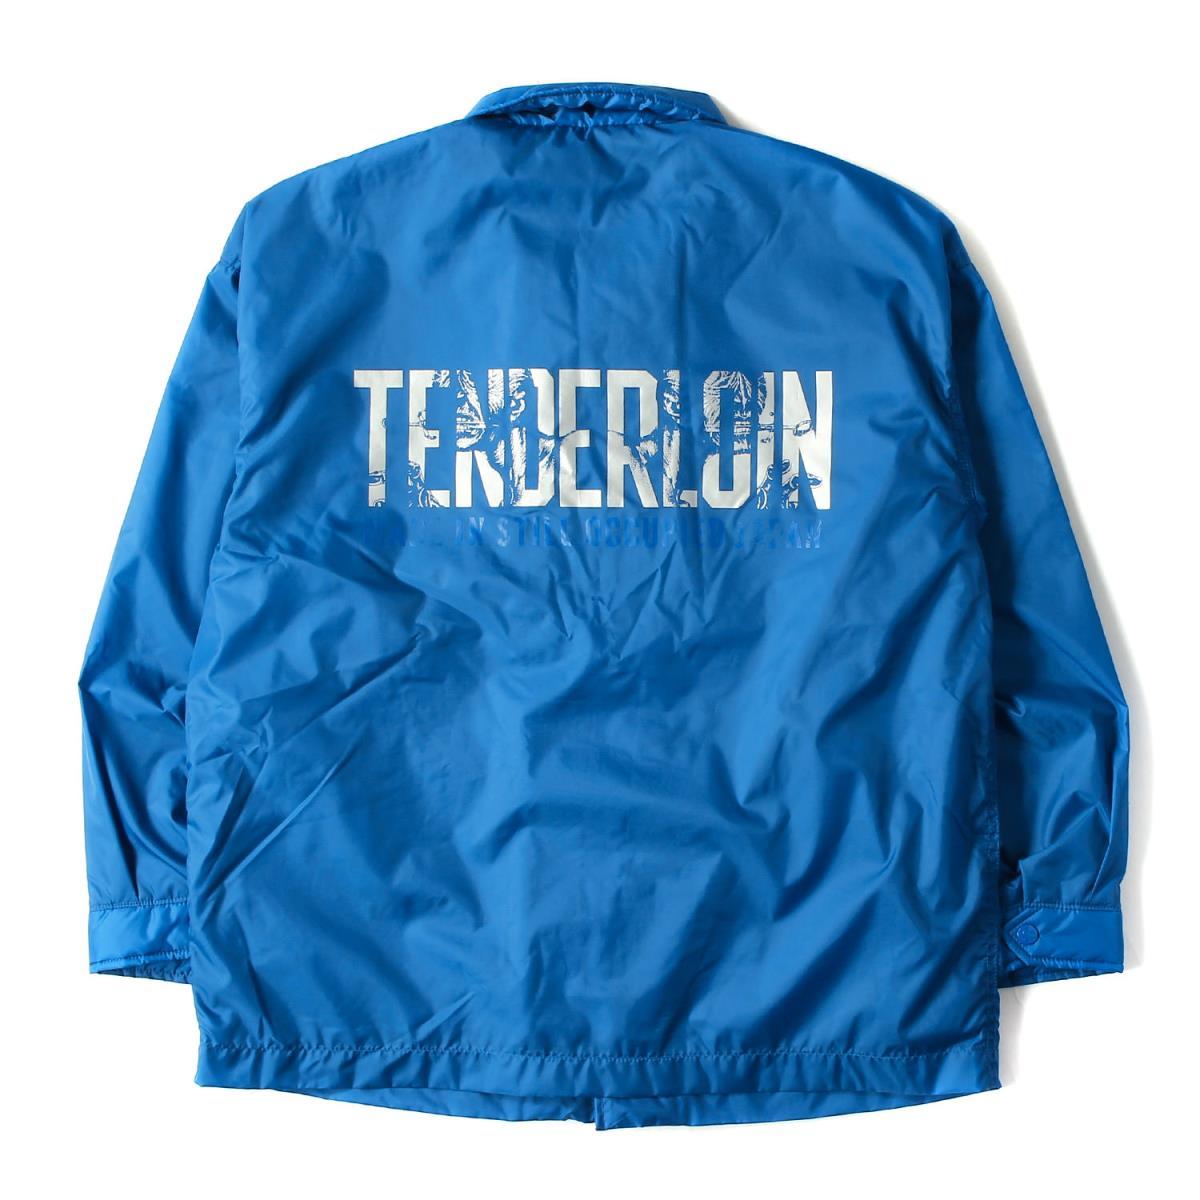 TENDERLOIN テンダーロイン ジャケット 18' グラフィックロゴ ナイロン コーチジャケット T NYLON COACH JKT QB サックス Sメンズ美品K2482K1lcJTF